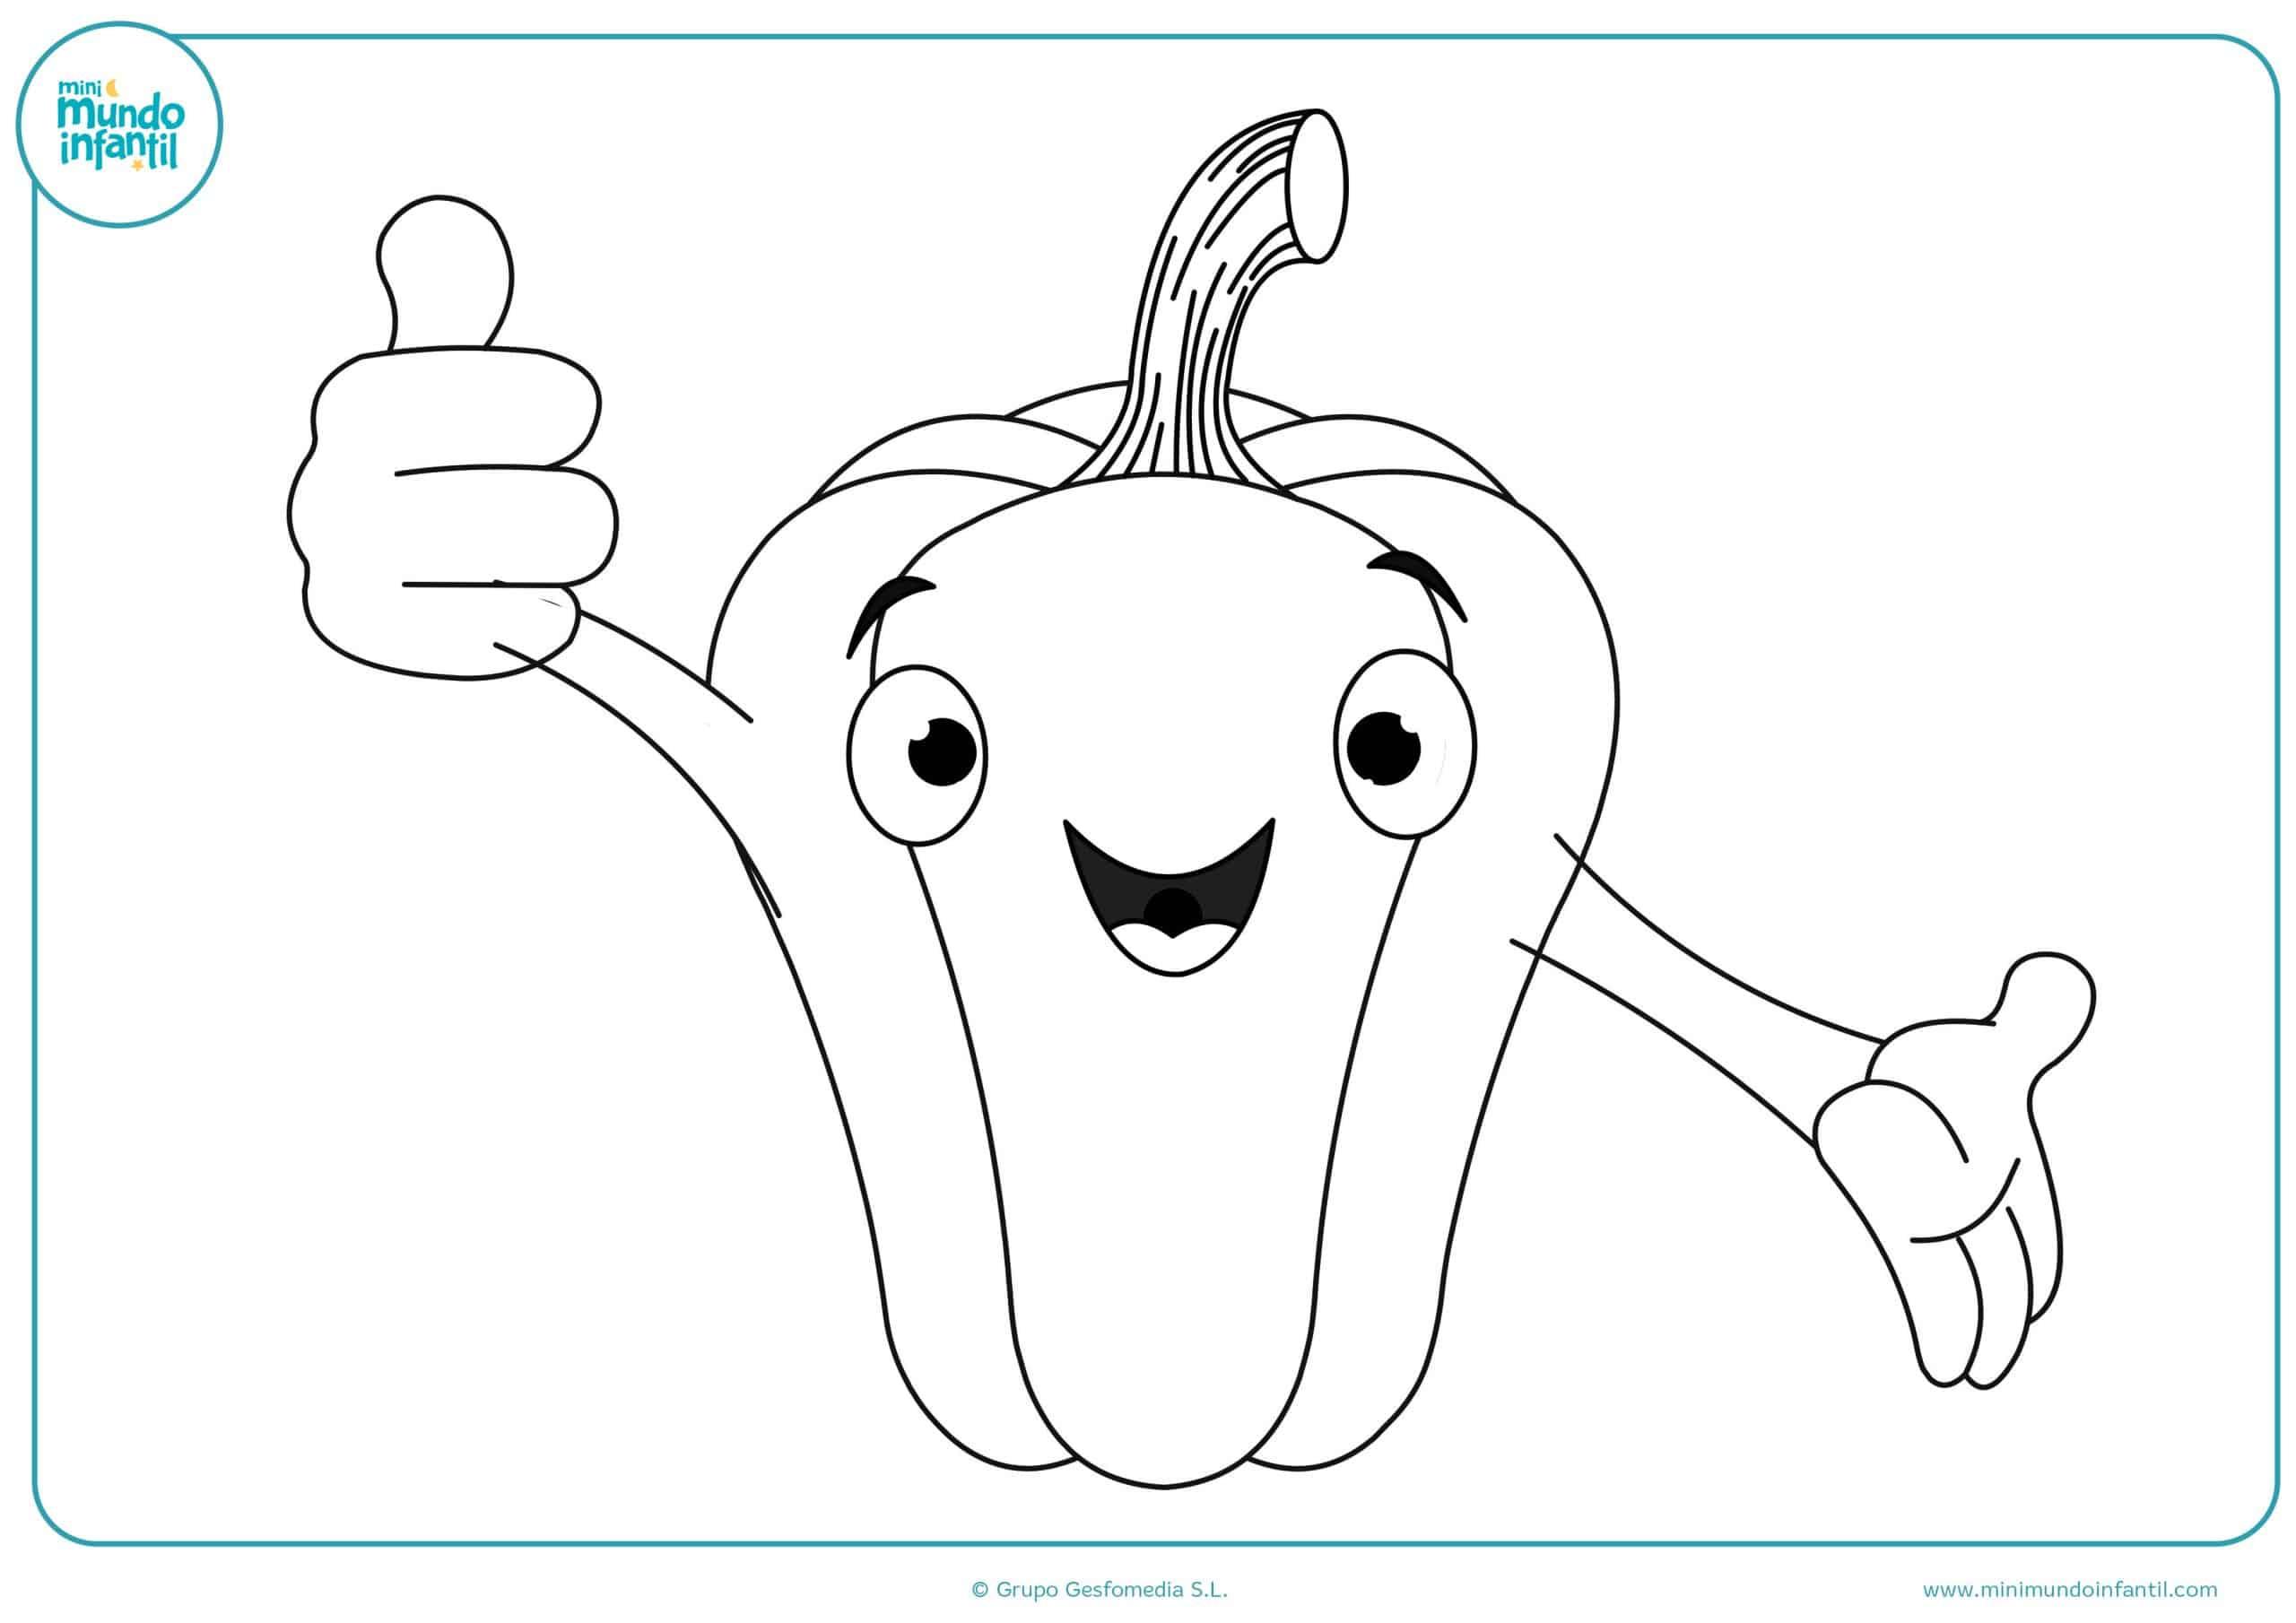 Colorear dibujos verduras gratis